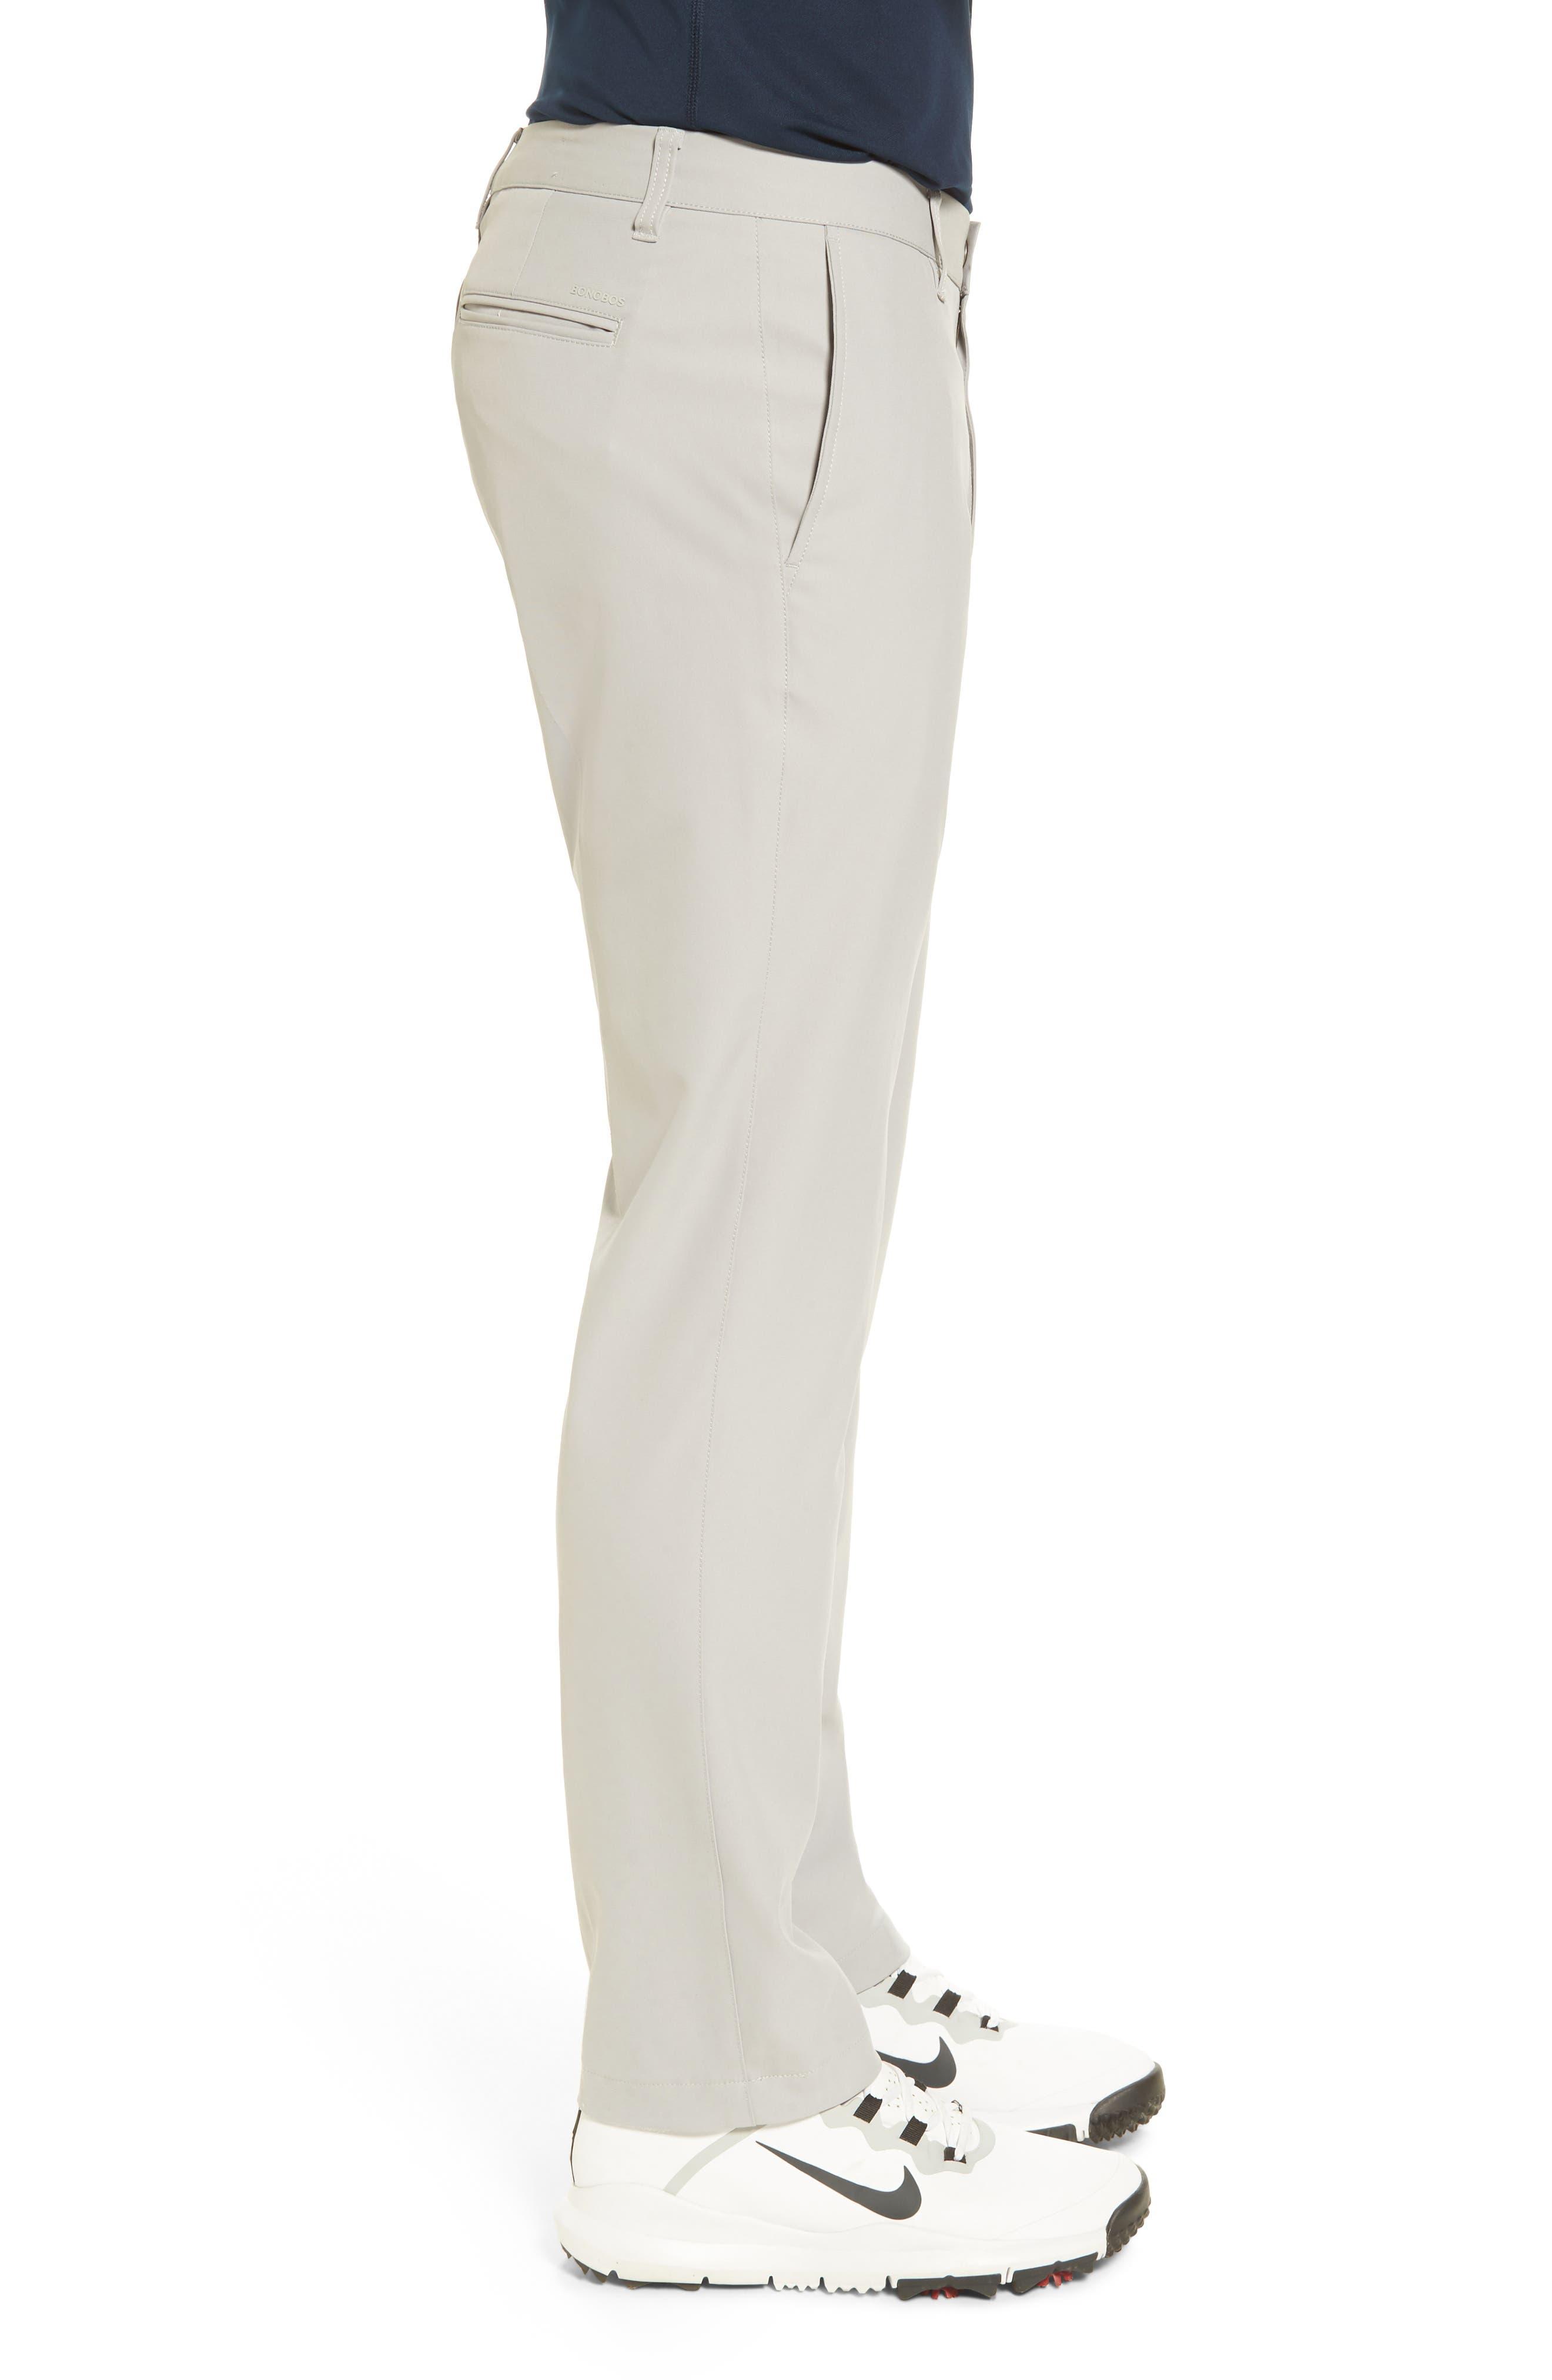 Highland Slim Fit Golf Pants,                             Alternate thumbnail 3, color,                             LIGHT GREY